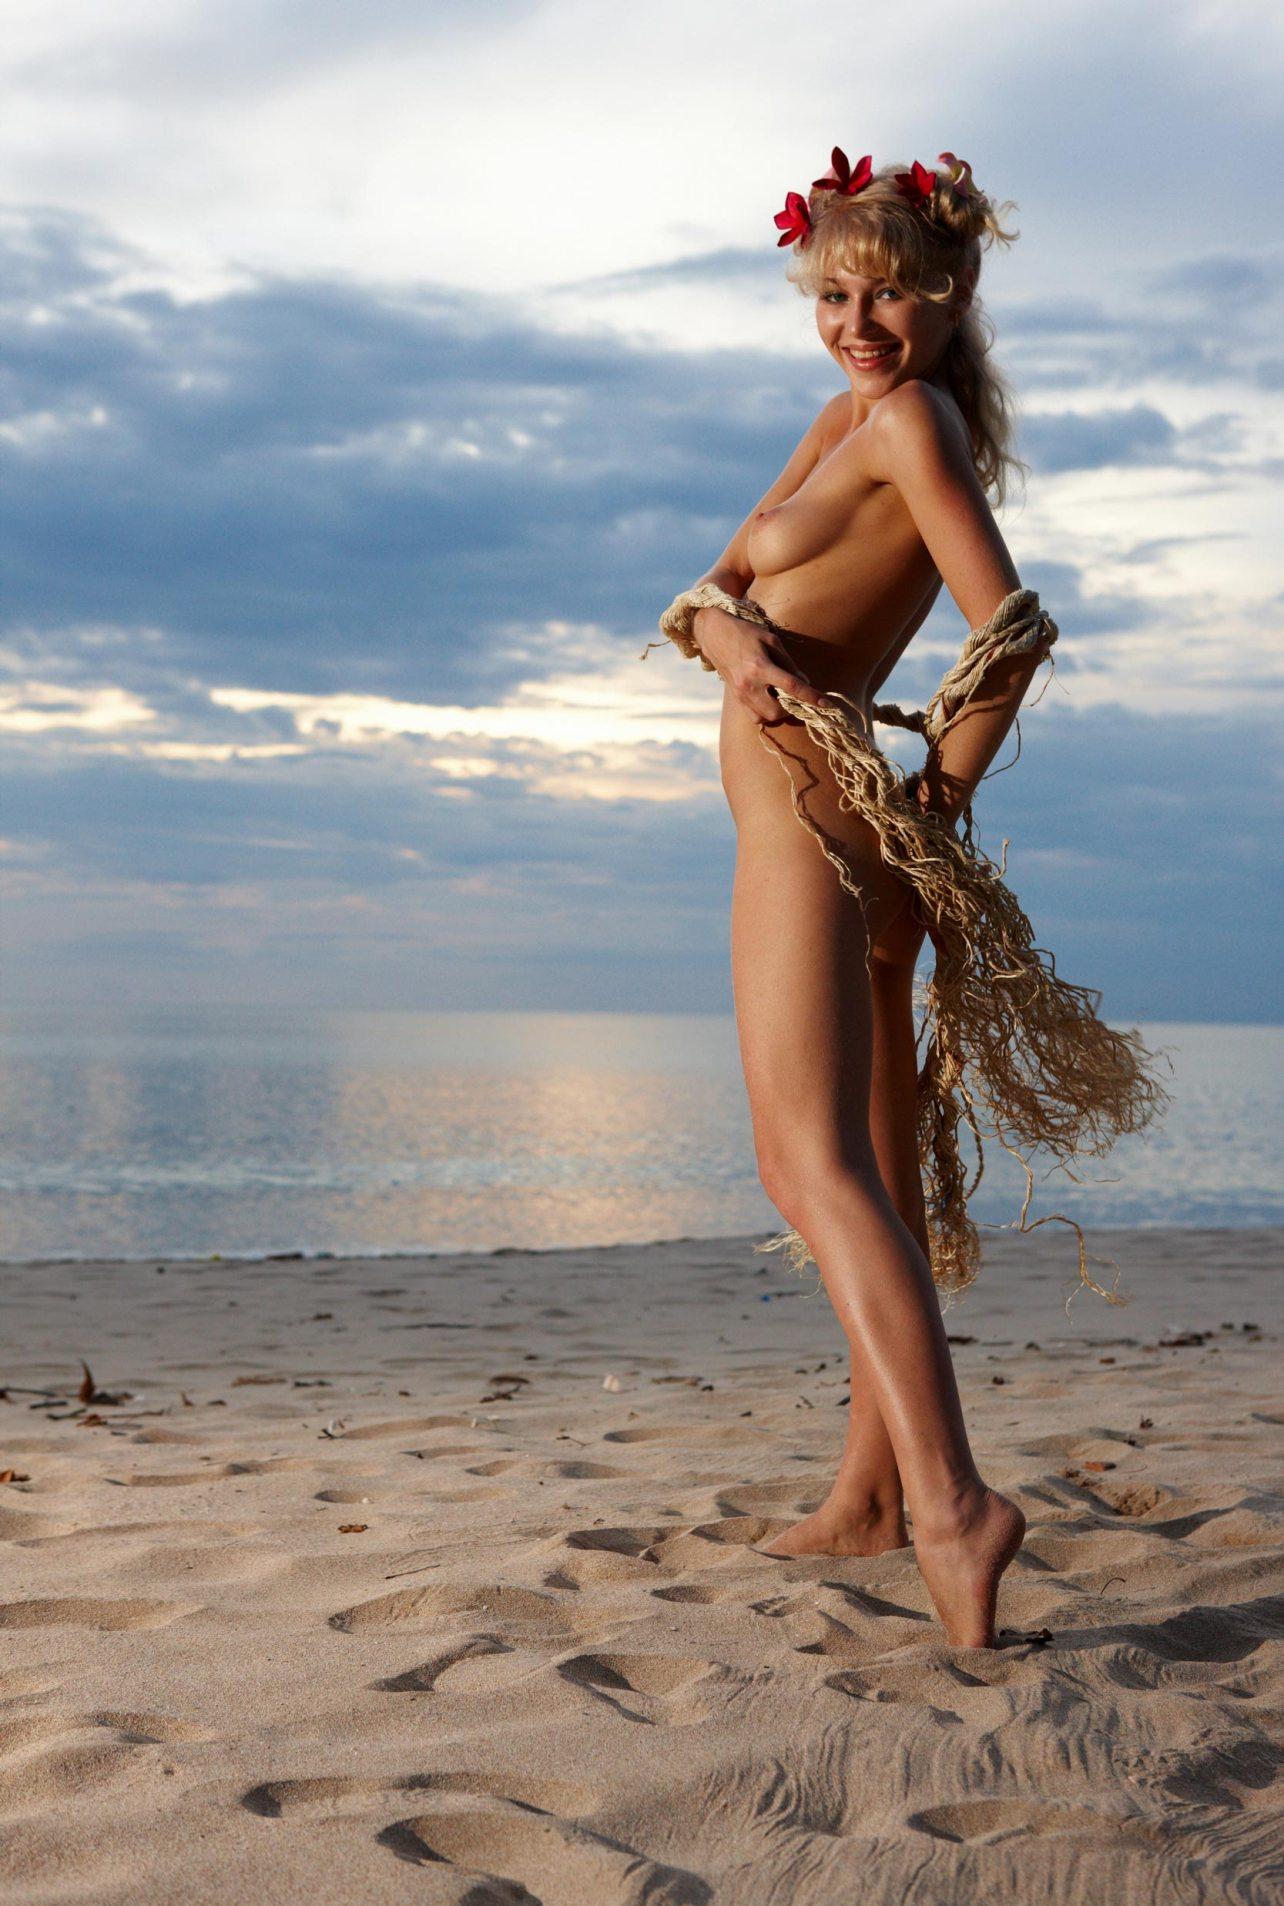 Эротика на острове дремутскам треугольником #10